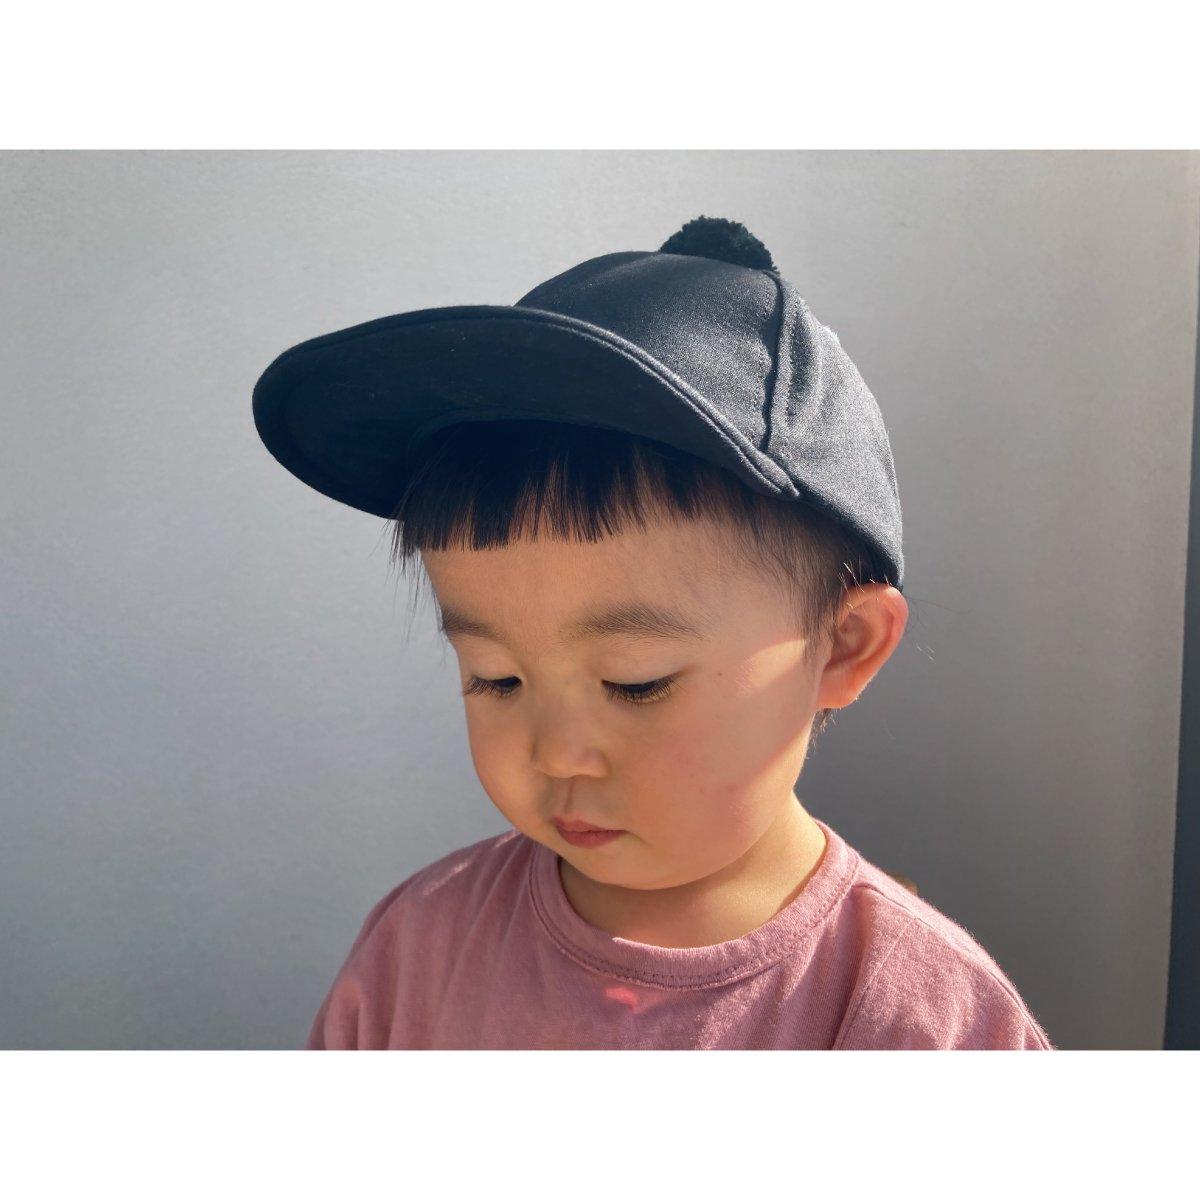 【KIDS】Dull Pon Cap 詳細画像30